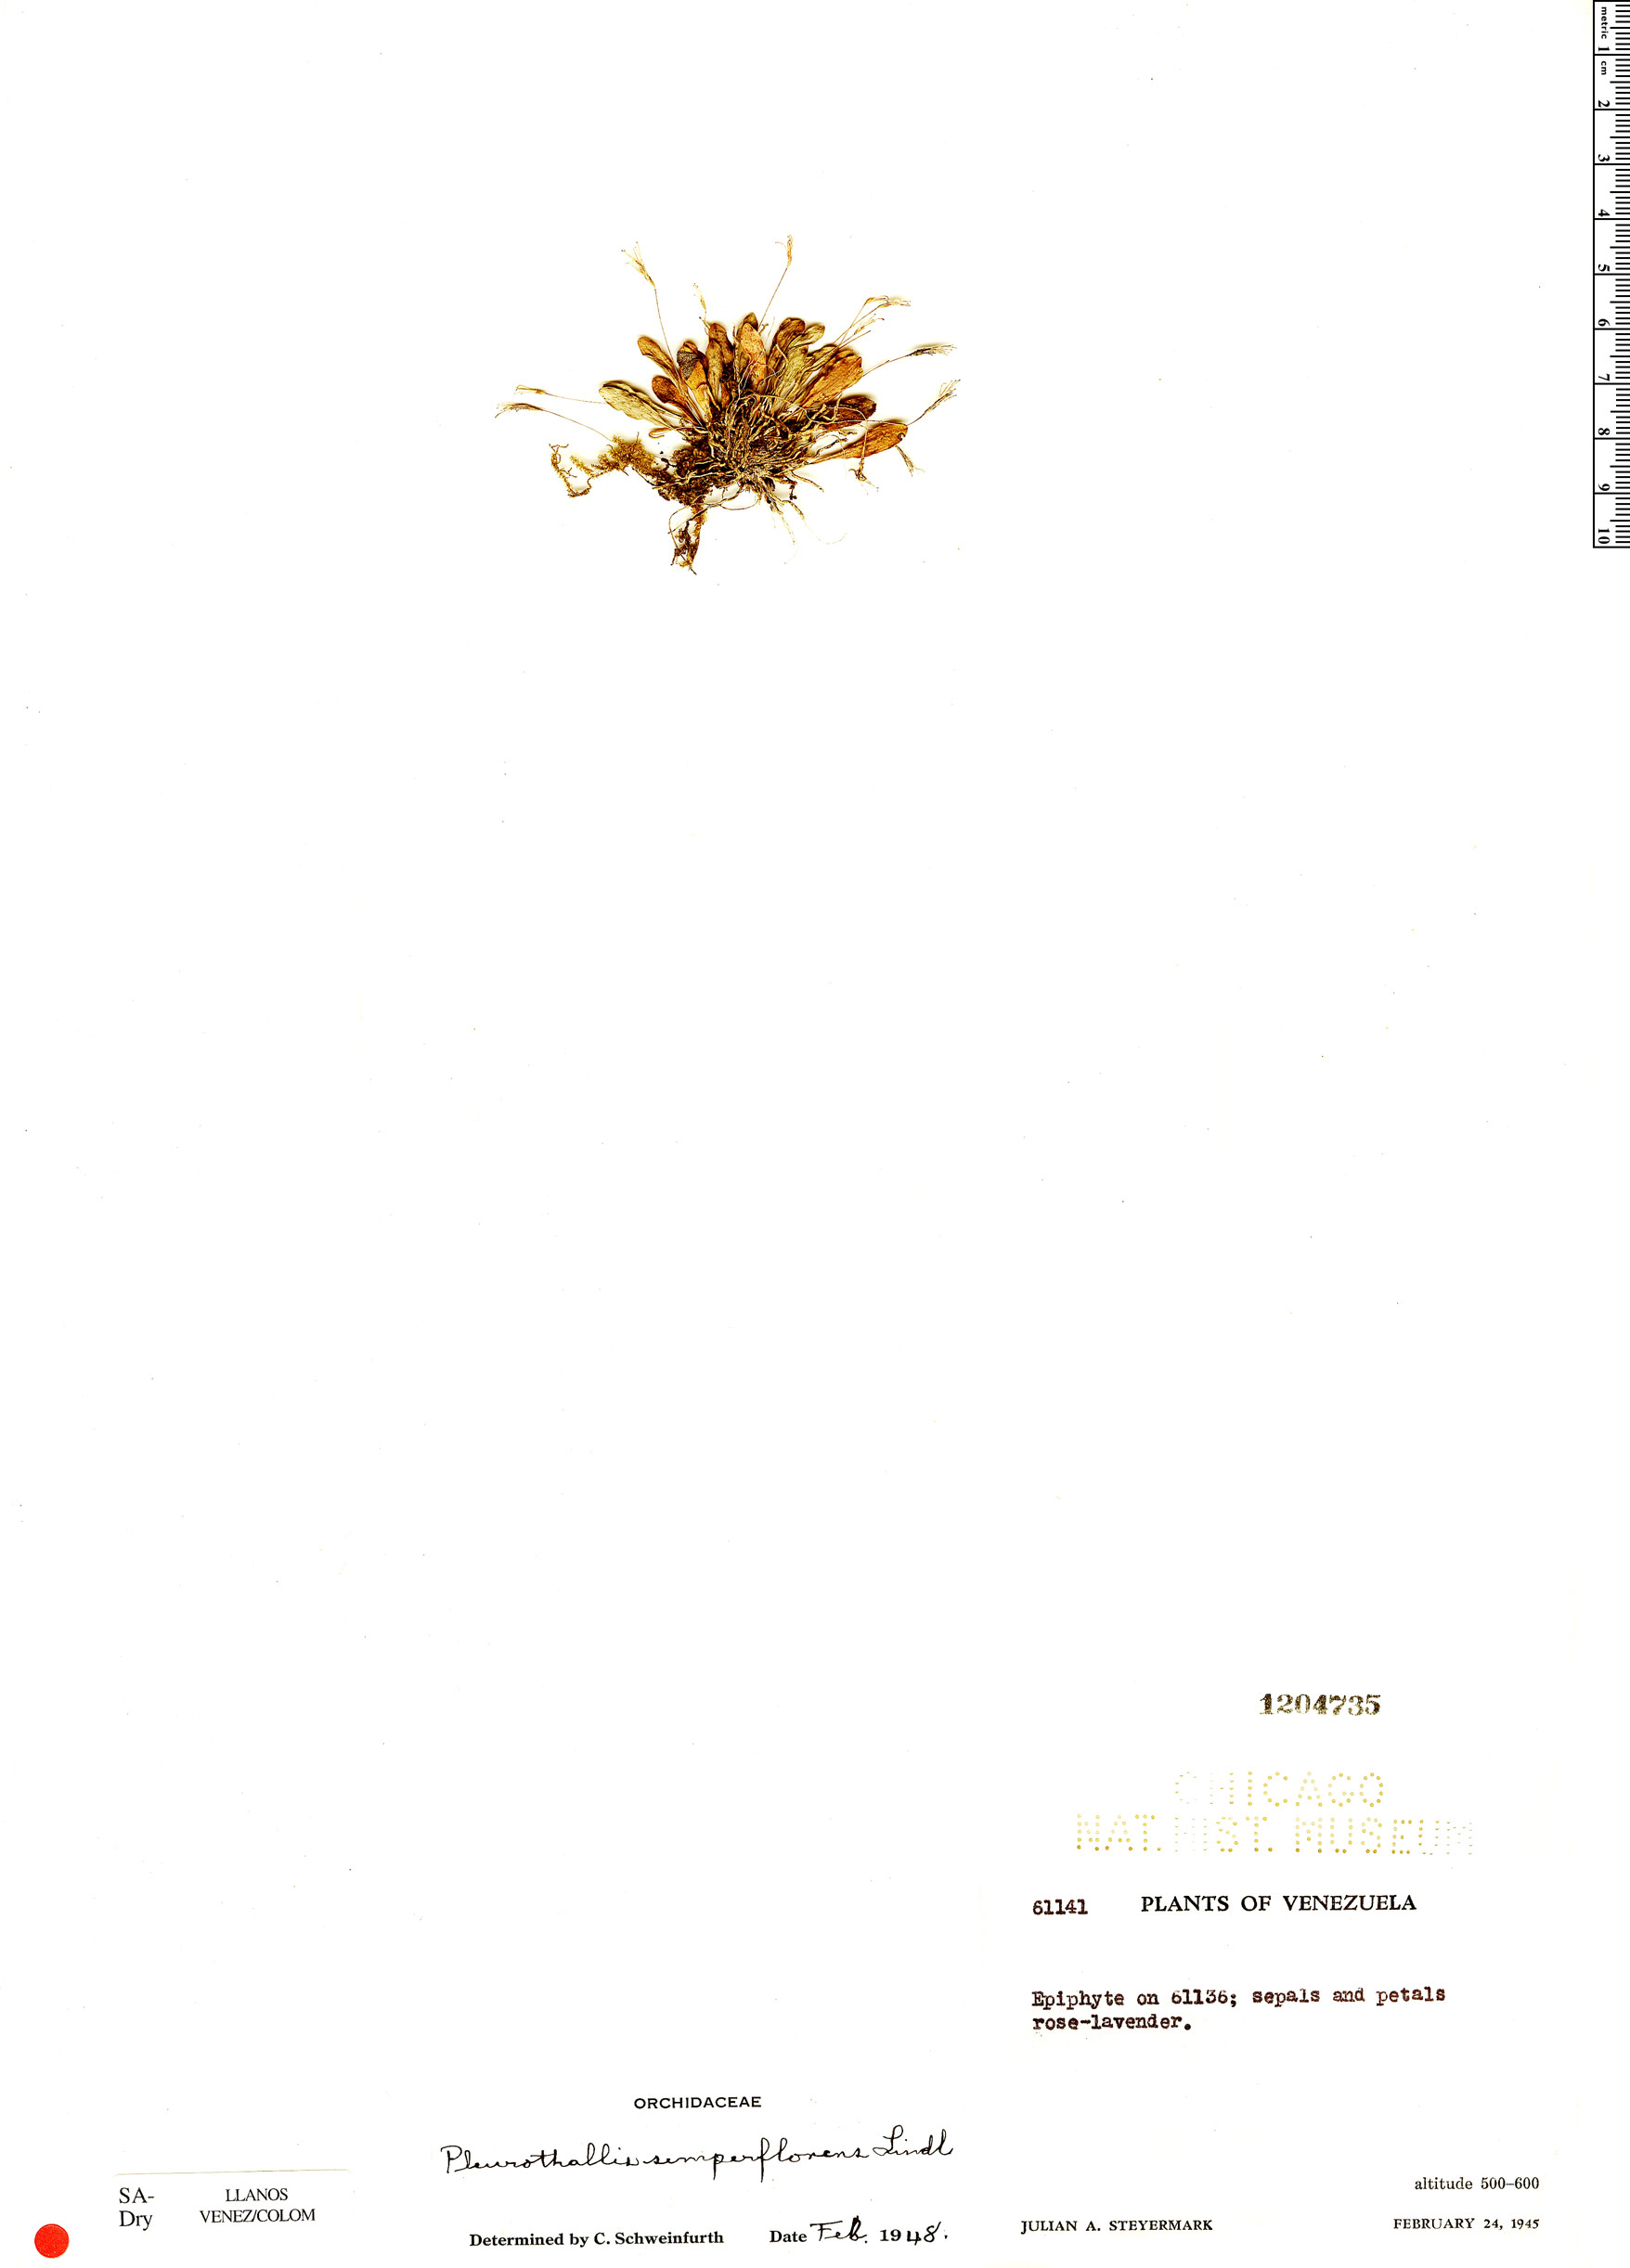 Specimen: Pleurothallis semperflorens